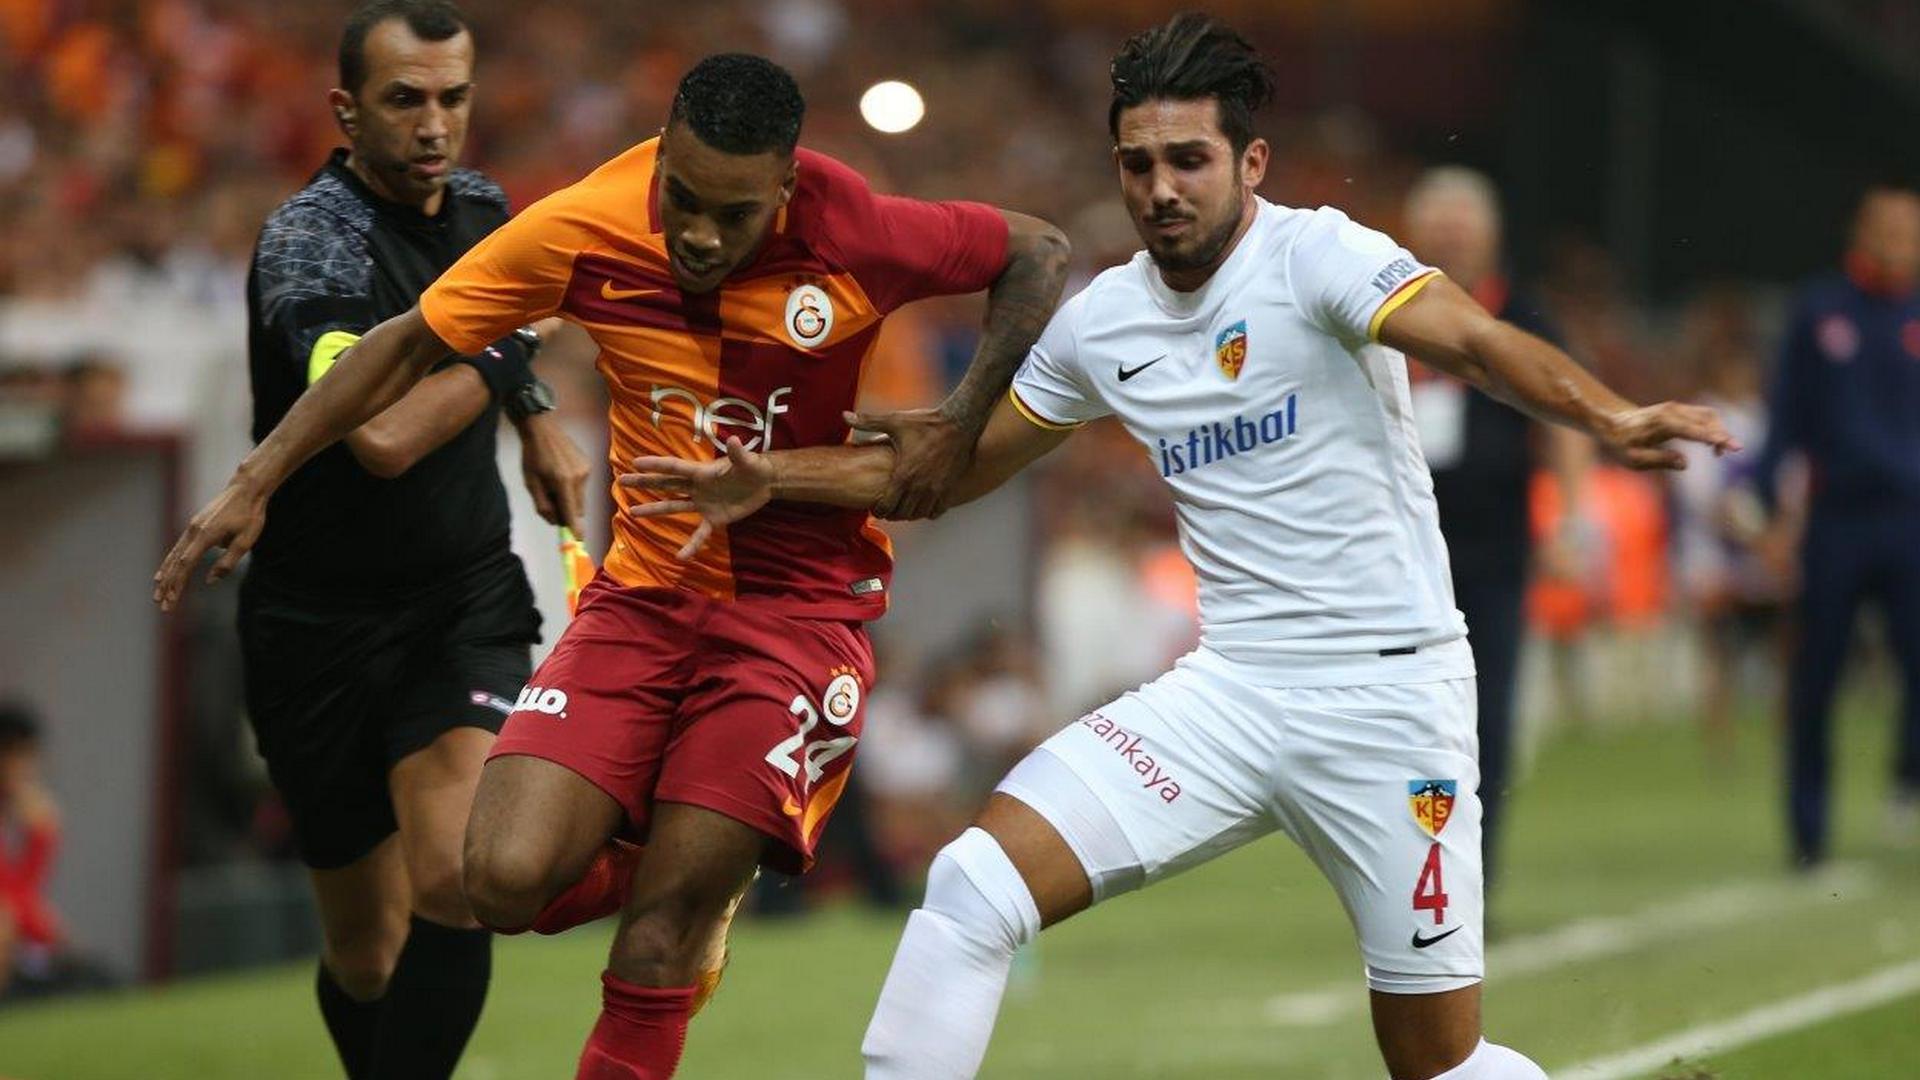 Garry Rodrigues Levent Gulen Galatasaray Kayserispor TSL 08142017